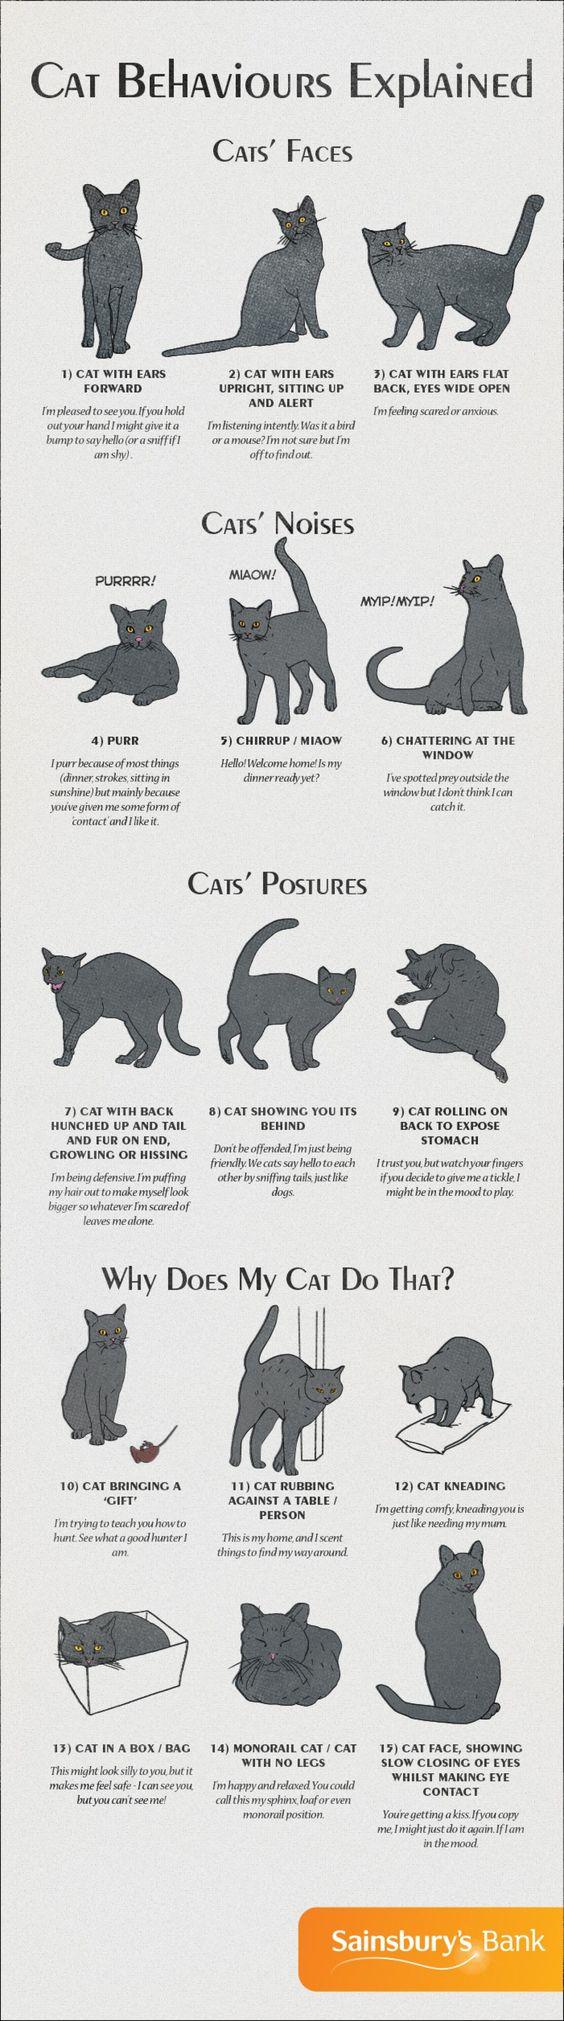 Cat Behavior Explained: 15 Cat Behaviors To Understand Your Cat Better